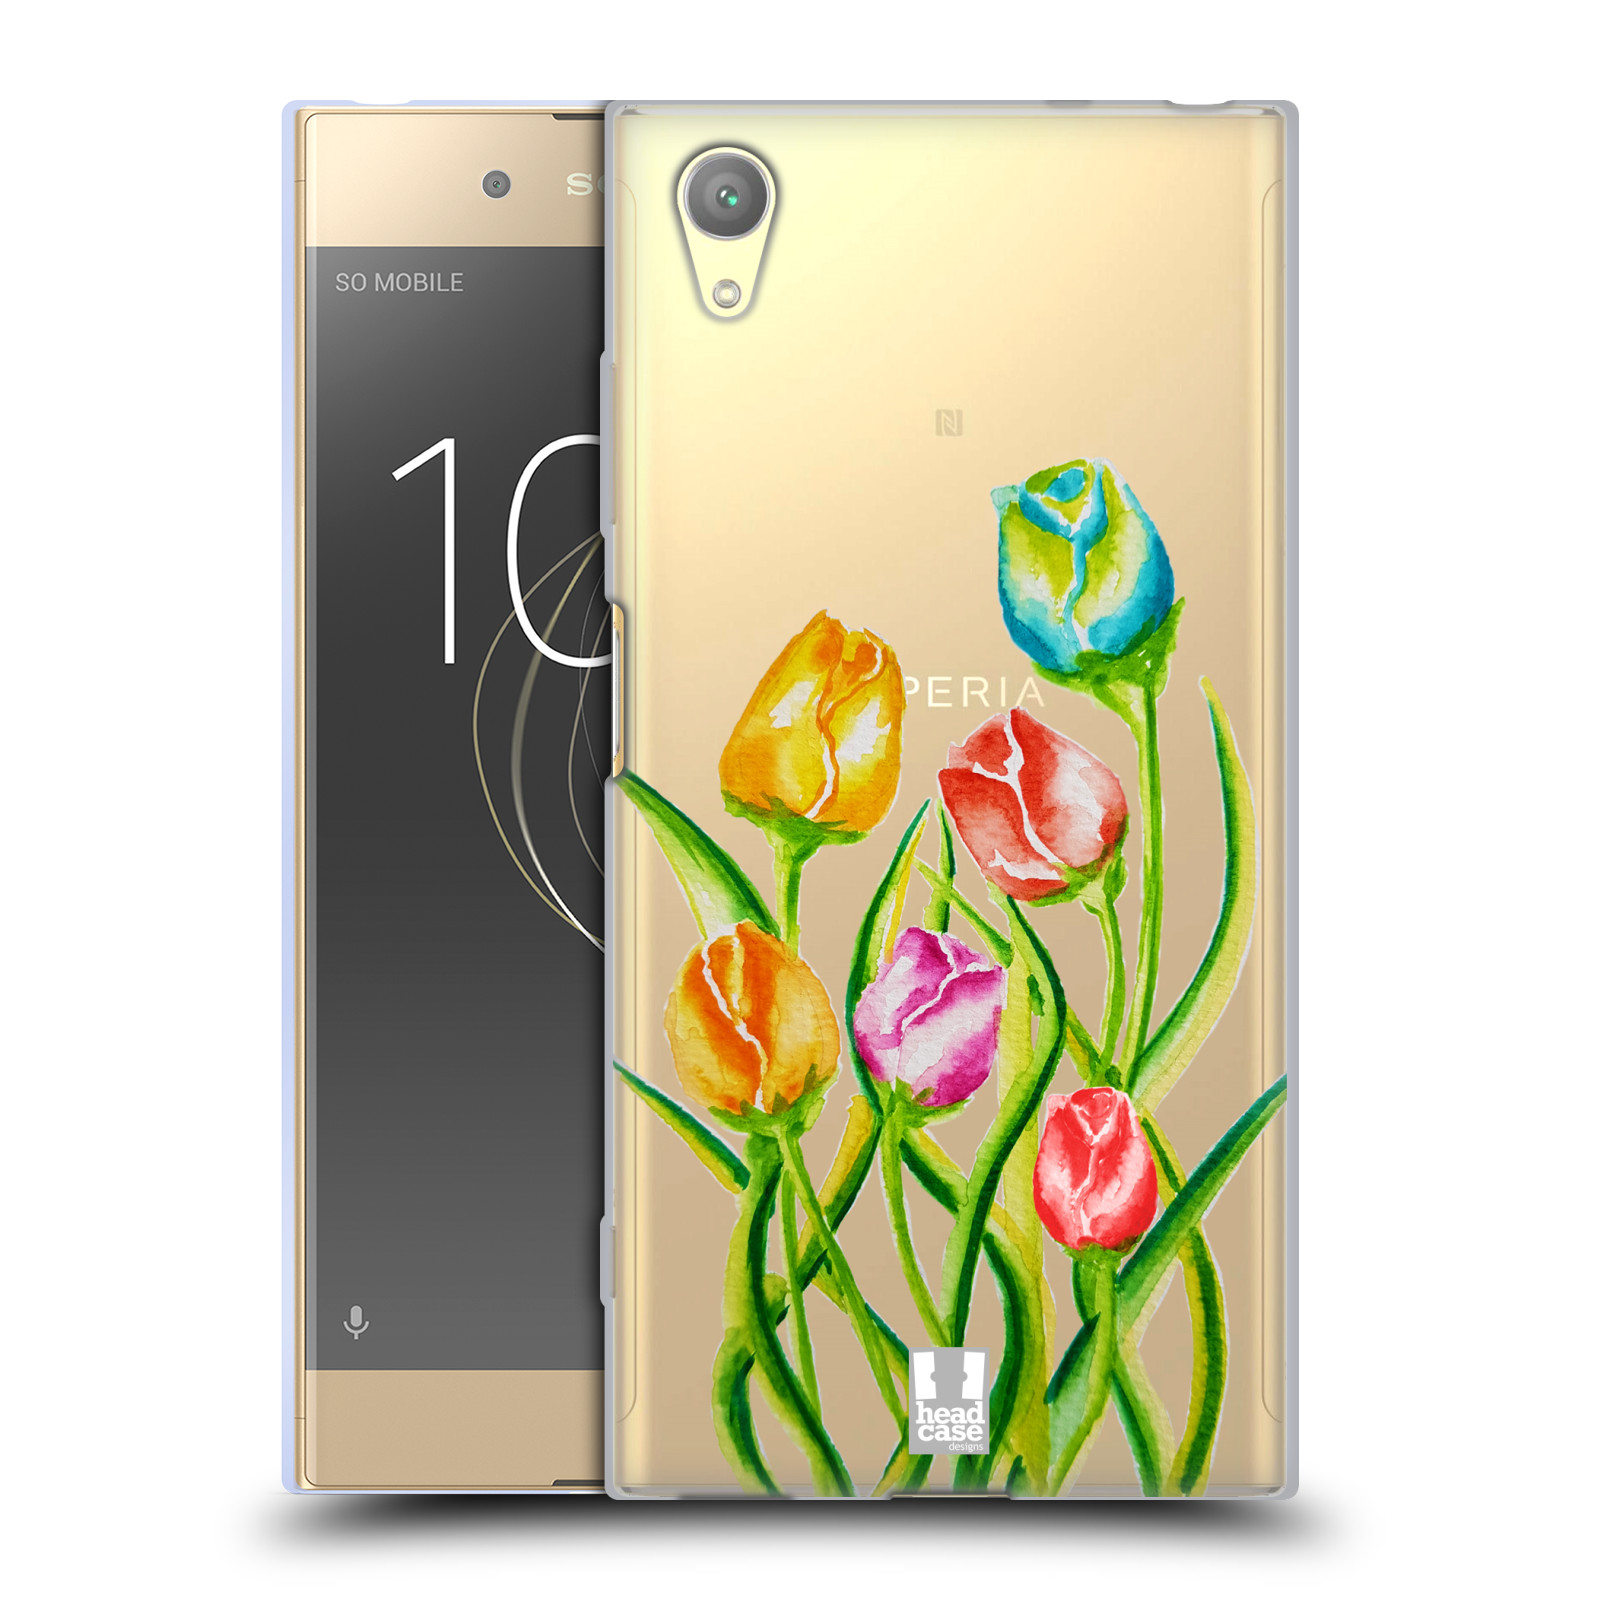 HEAD CASE silikonový obal na mobil Sony Xperia XA1 PLUS Květina Tulipán vodní barvy